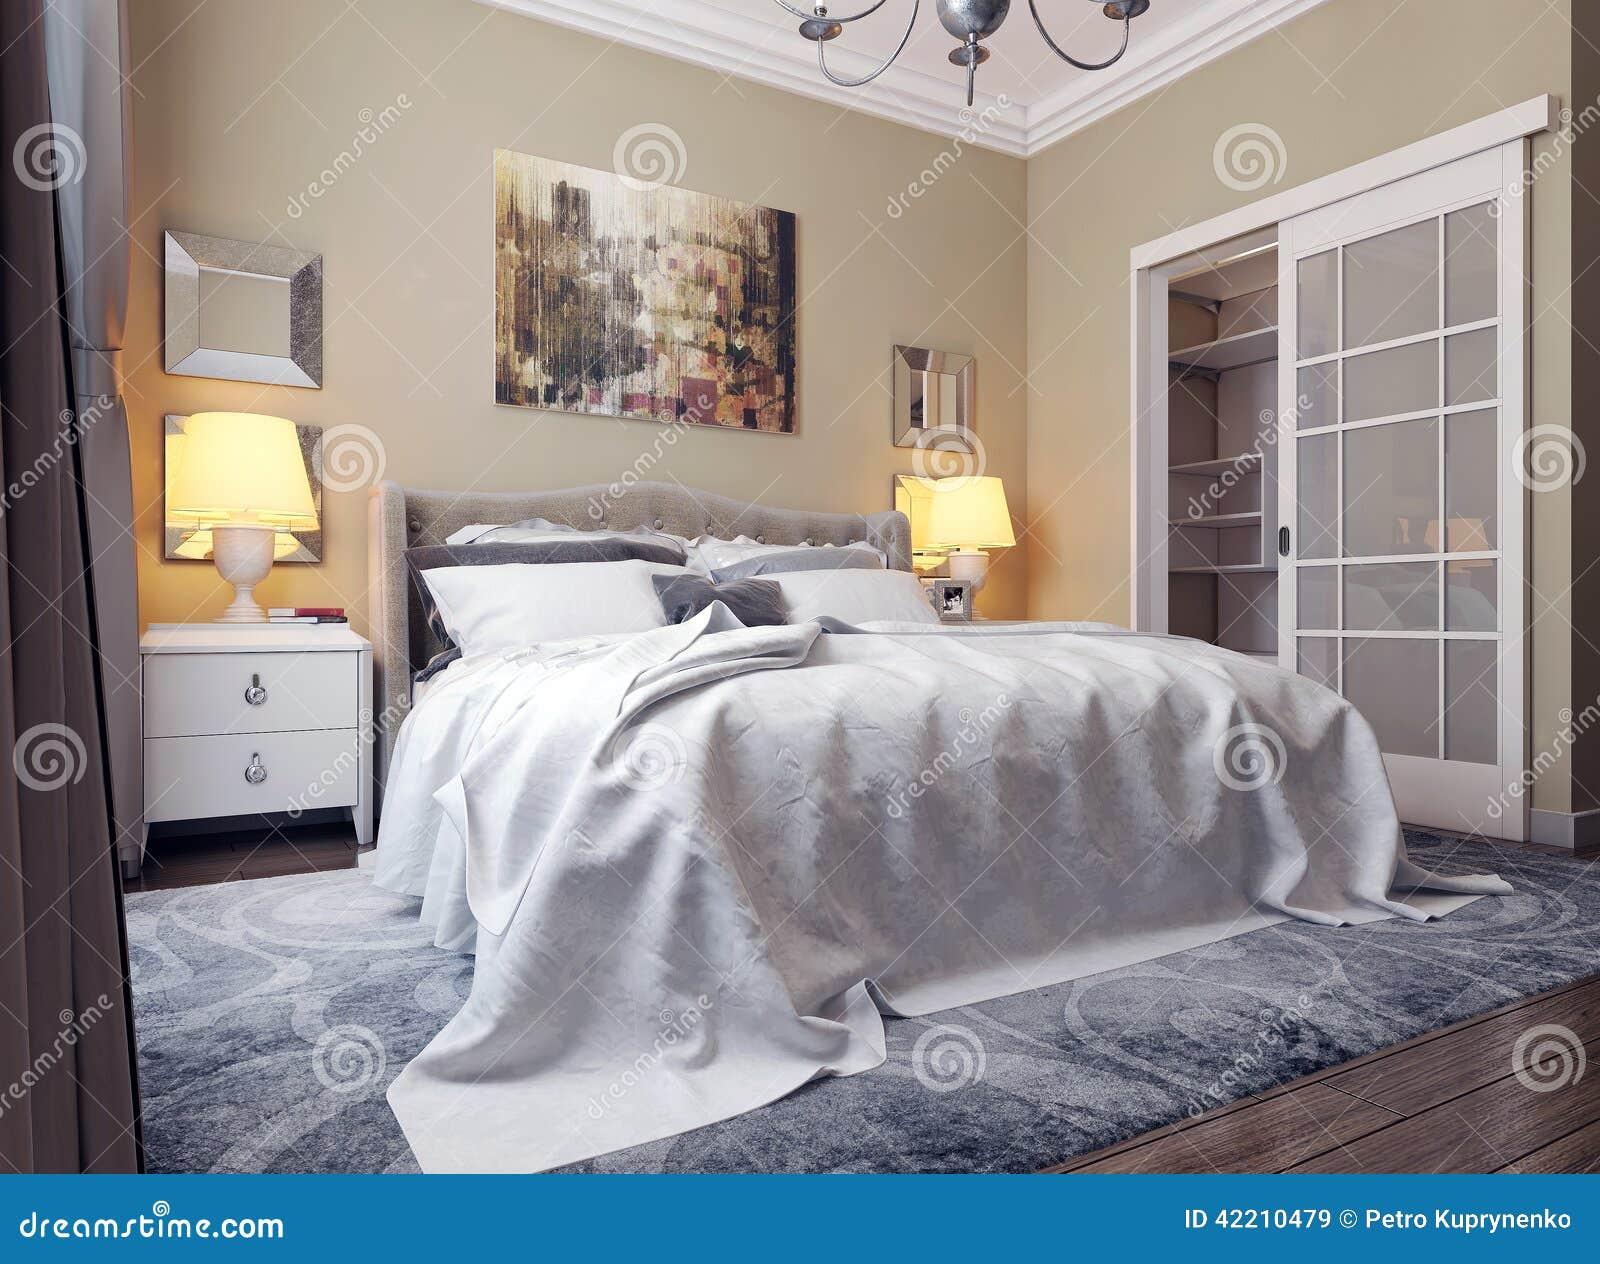 Sovrum I Neoclassicismstil Stock Illustrationer - Bild: 42210479